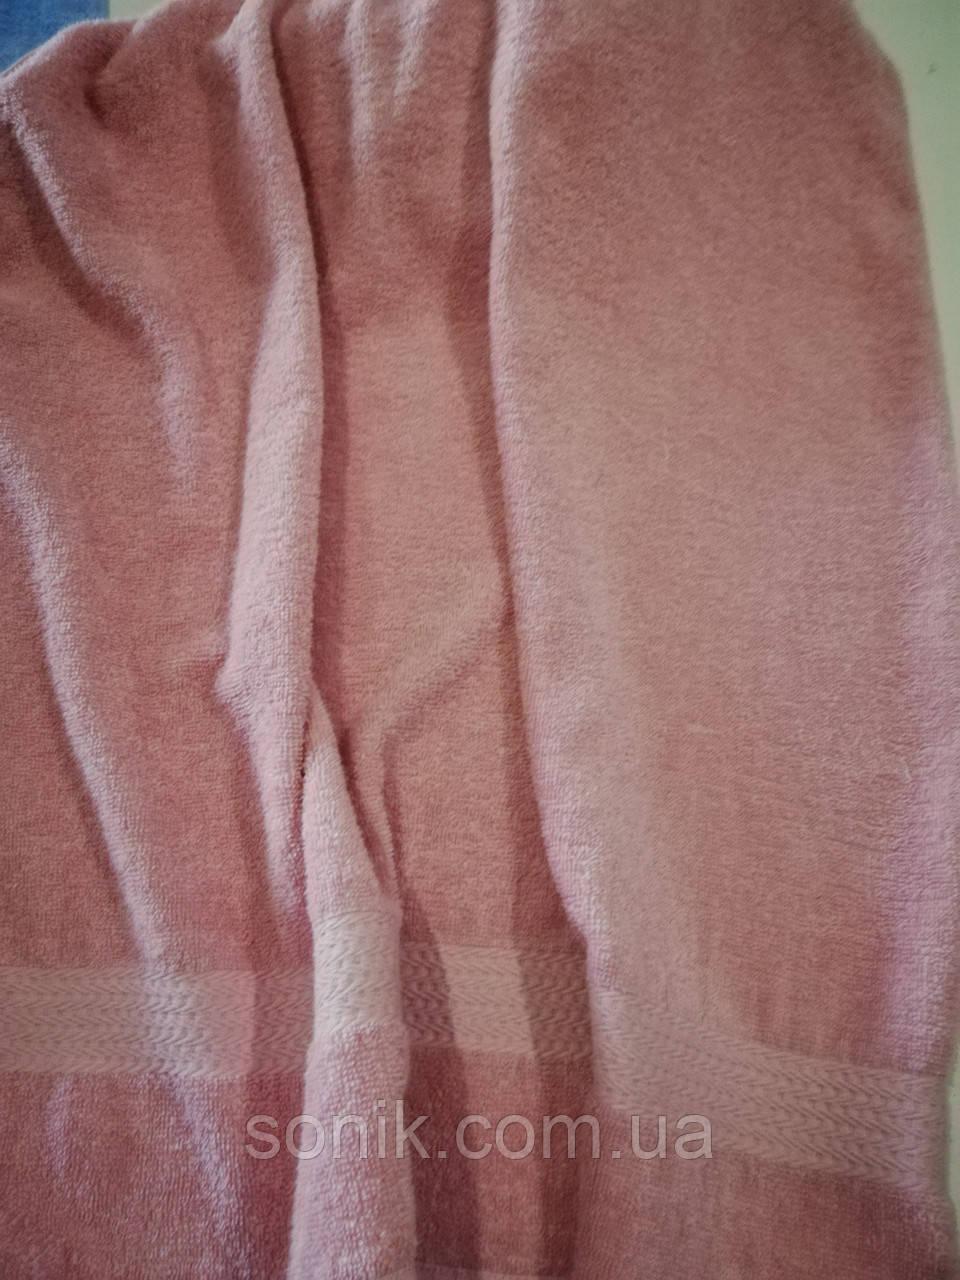 Полотенце махровое бледно-розовое 70*140